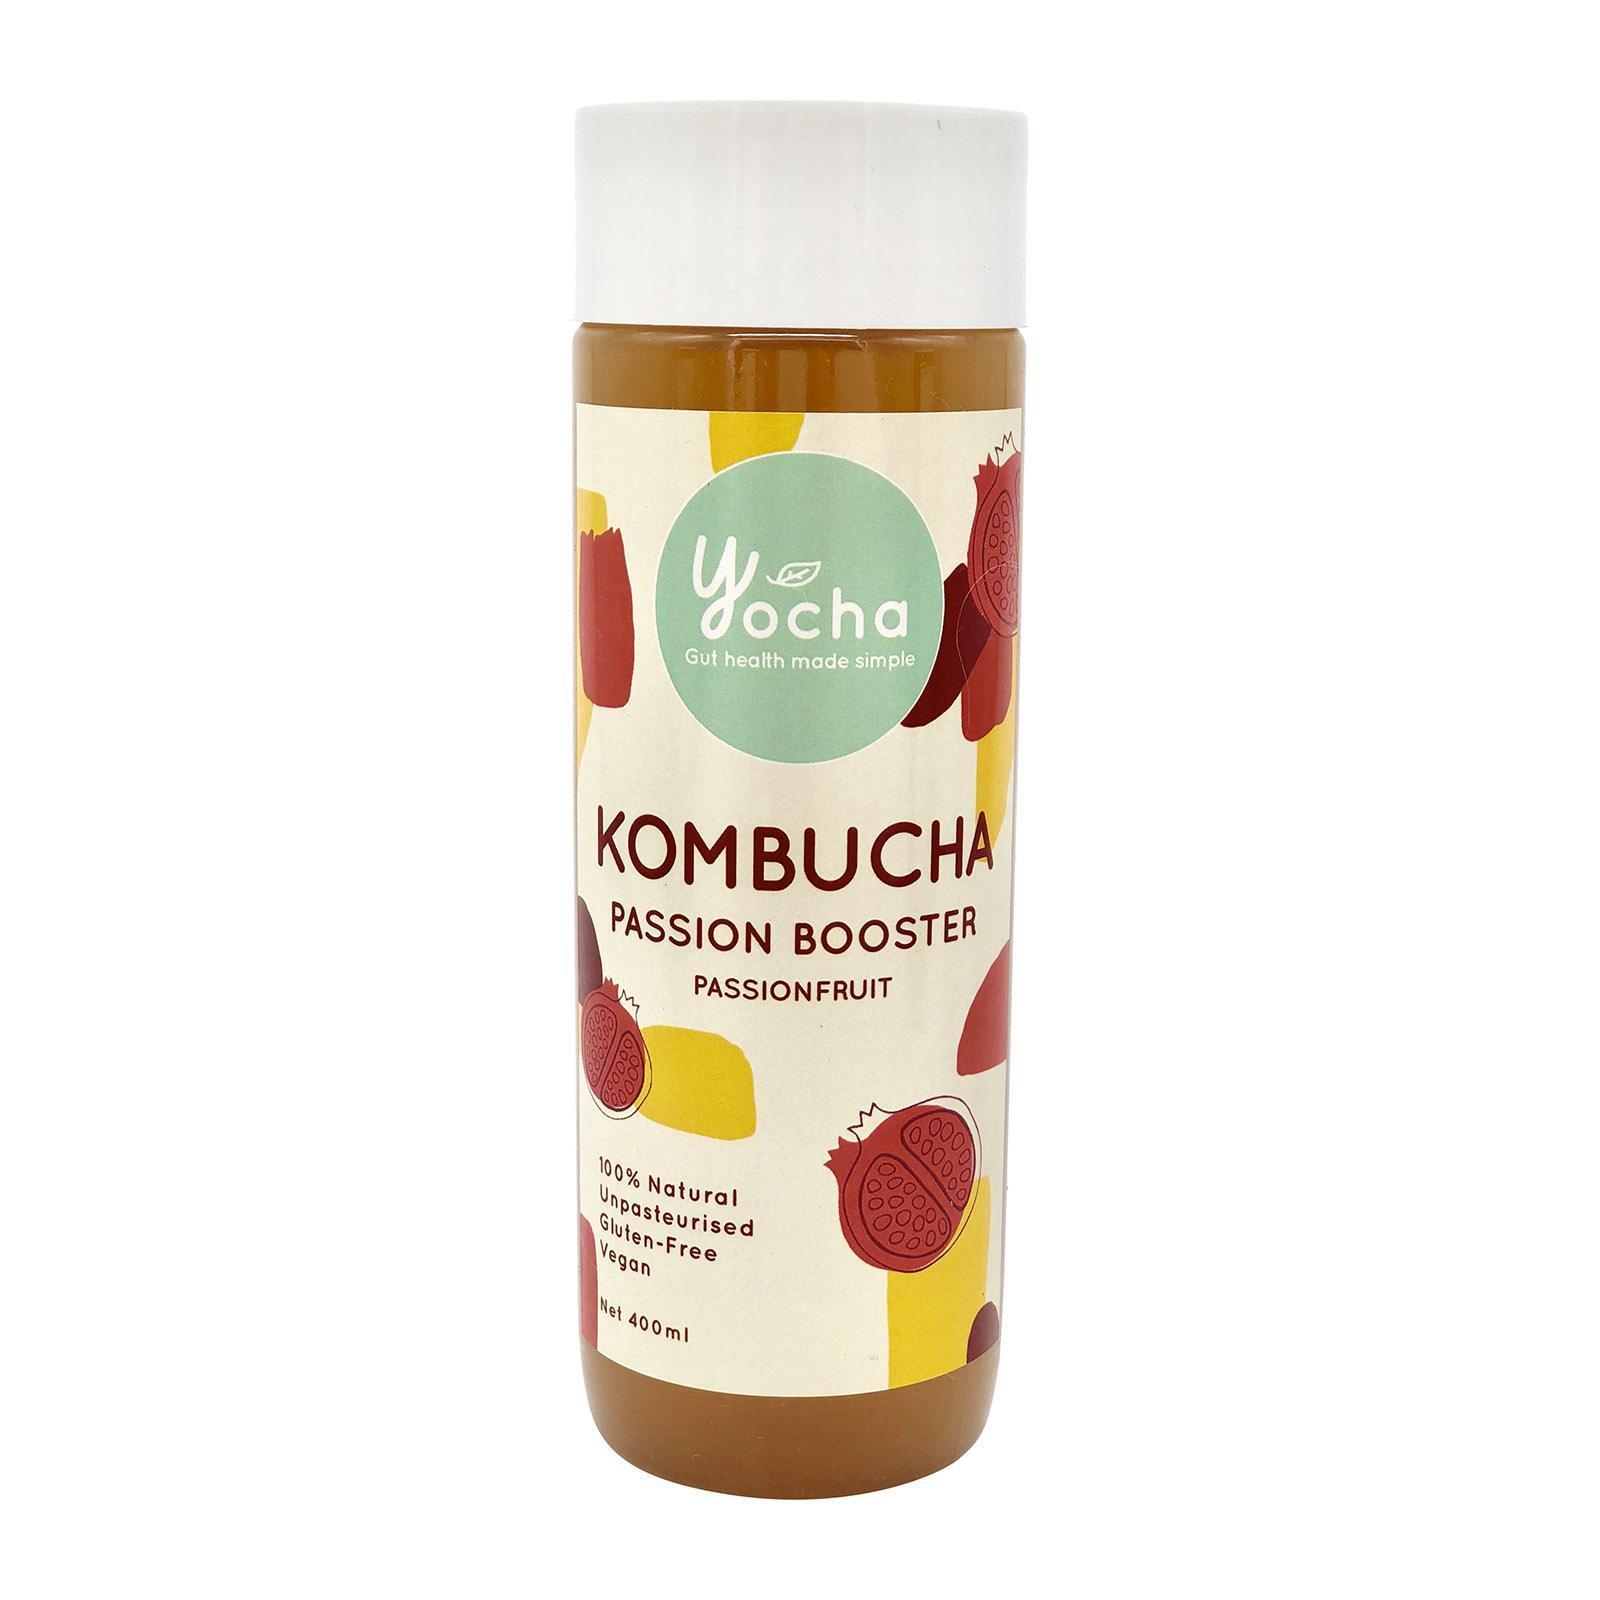 Yocha Kombucha Passion Booster - Passionfruit By Redmart.